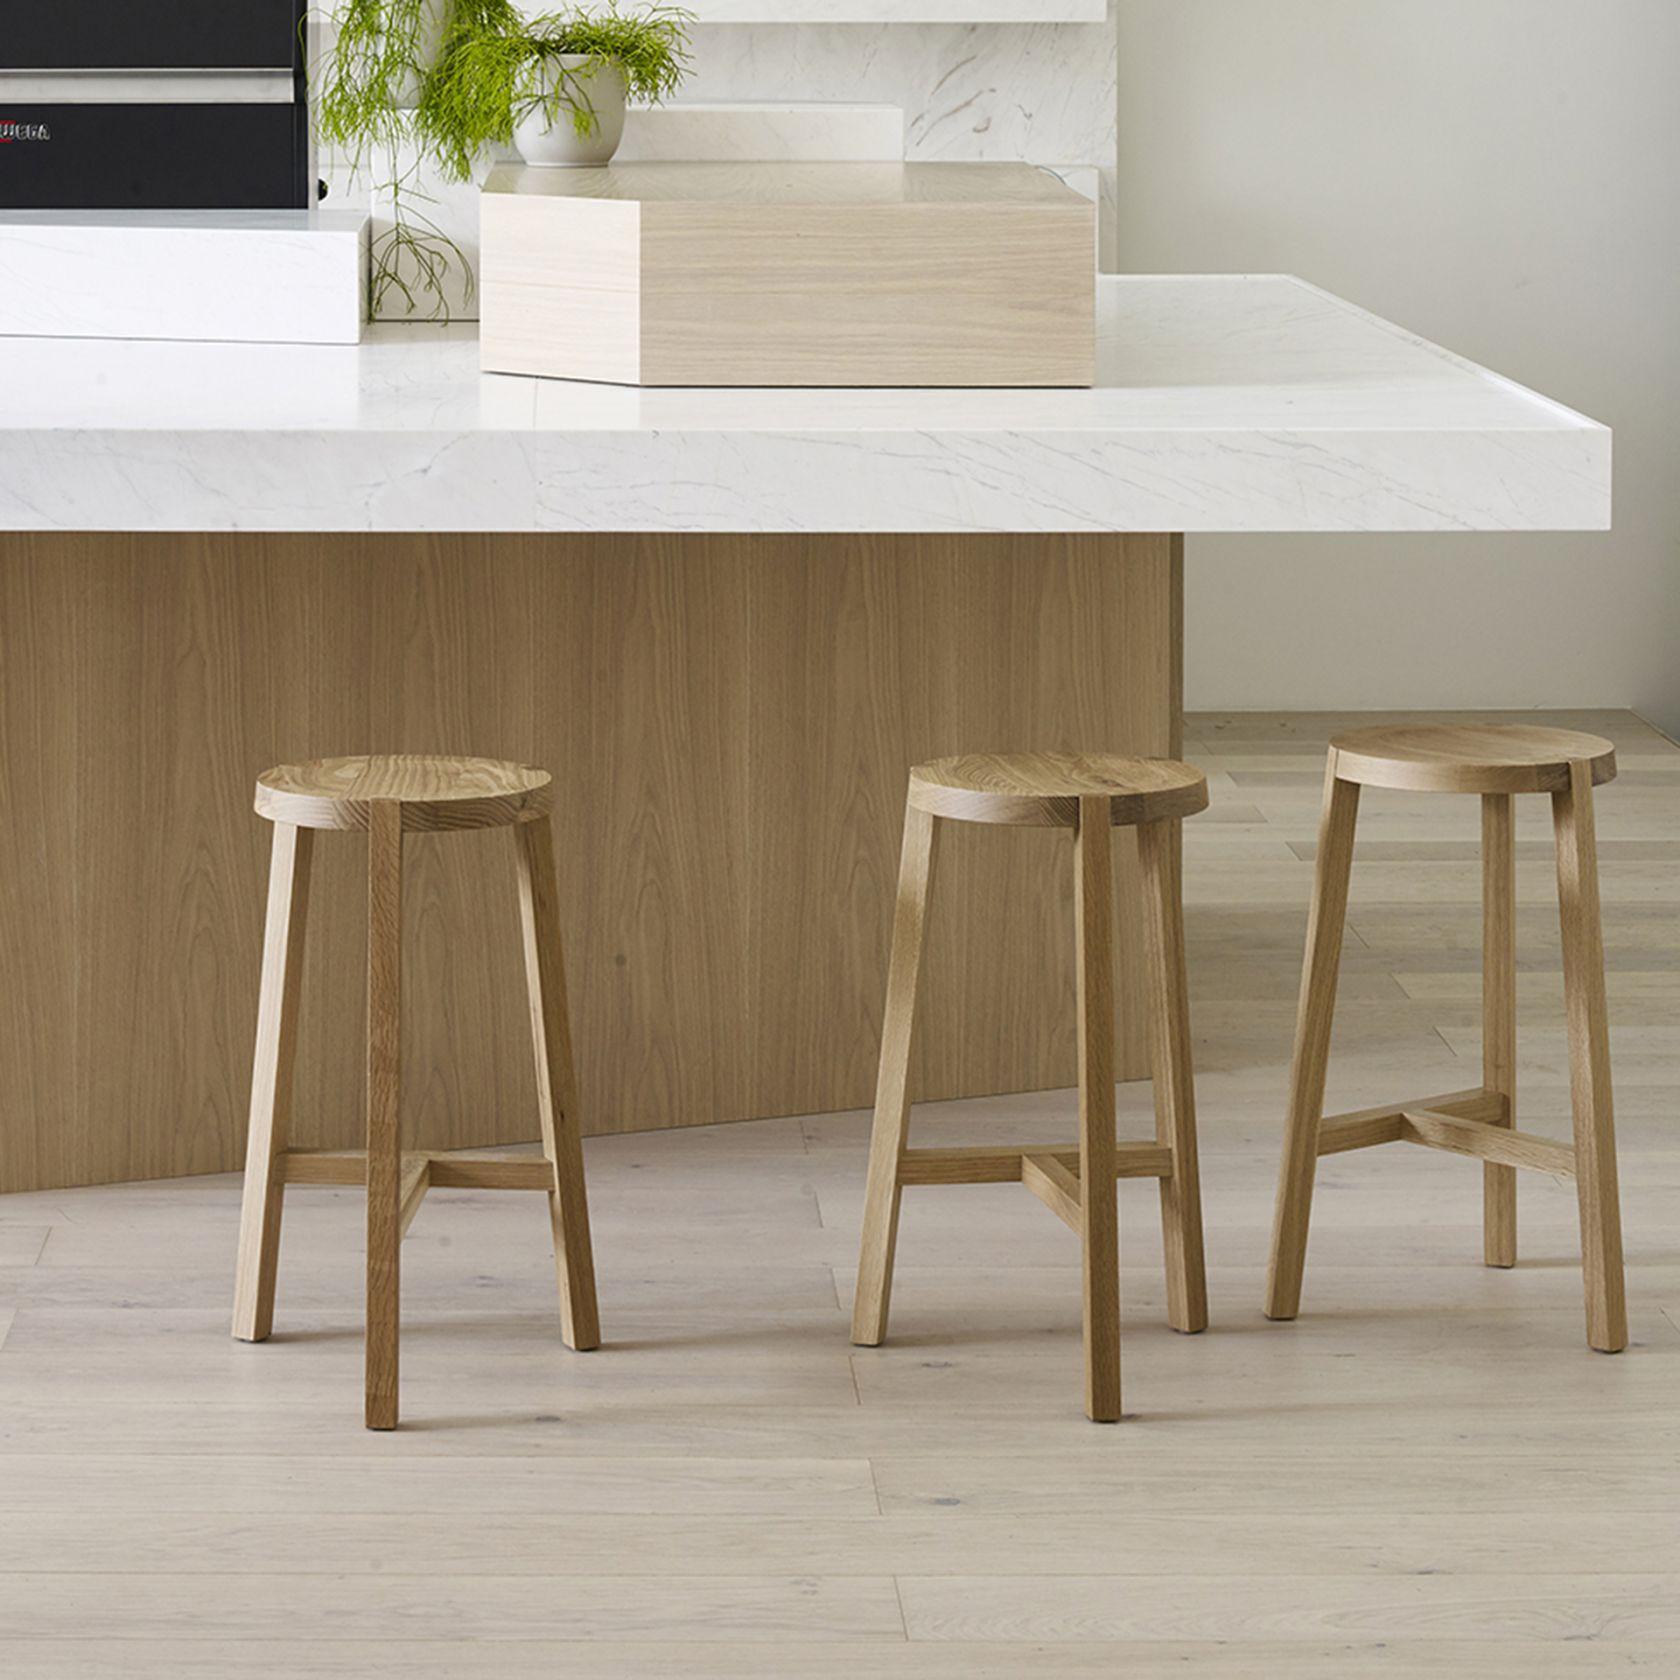 toro-stool